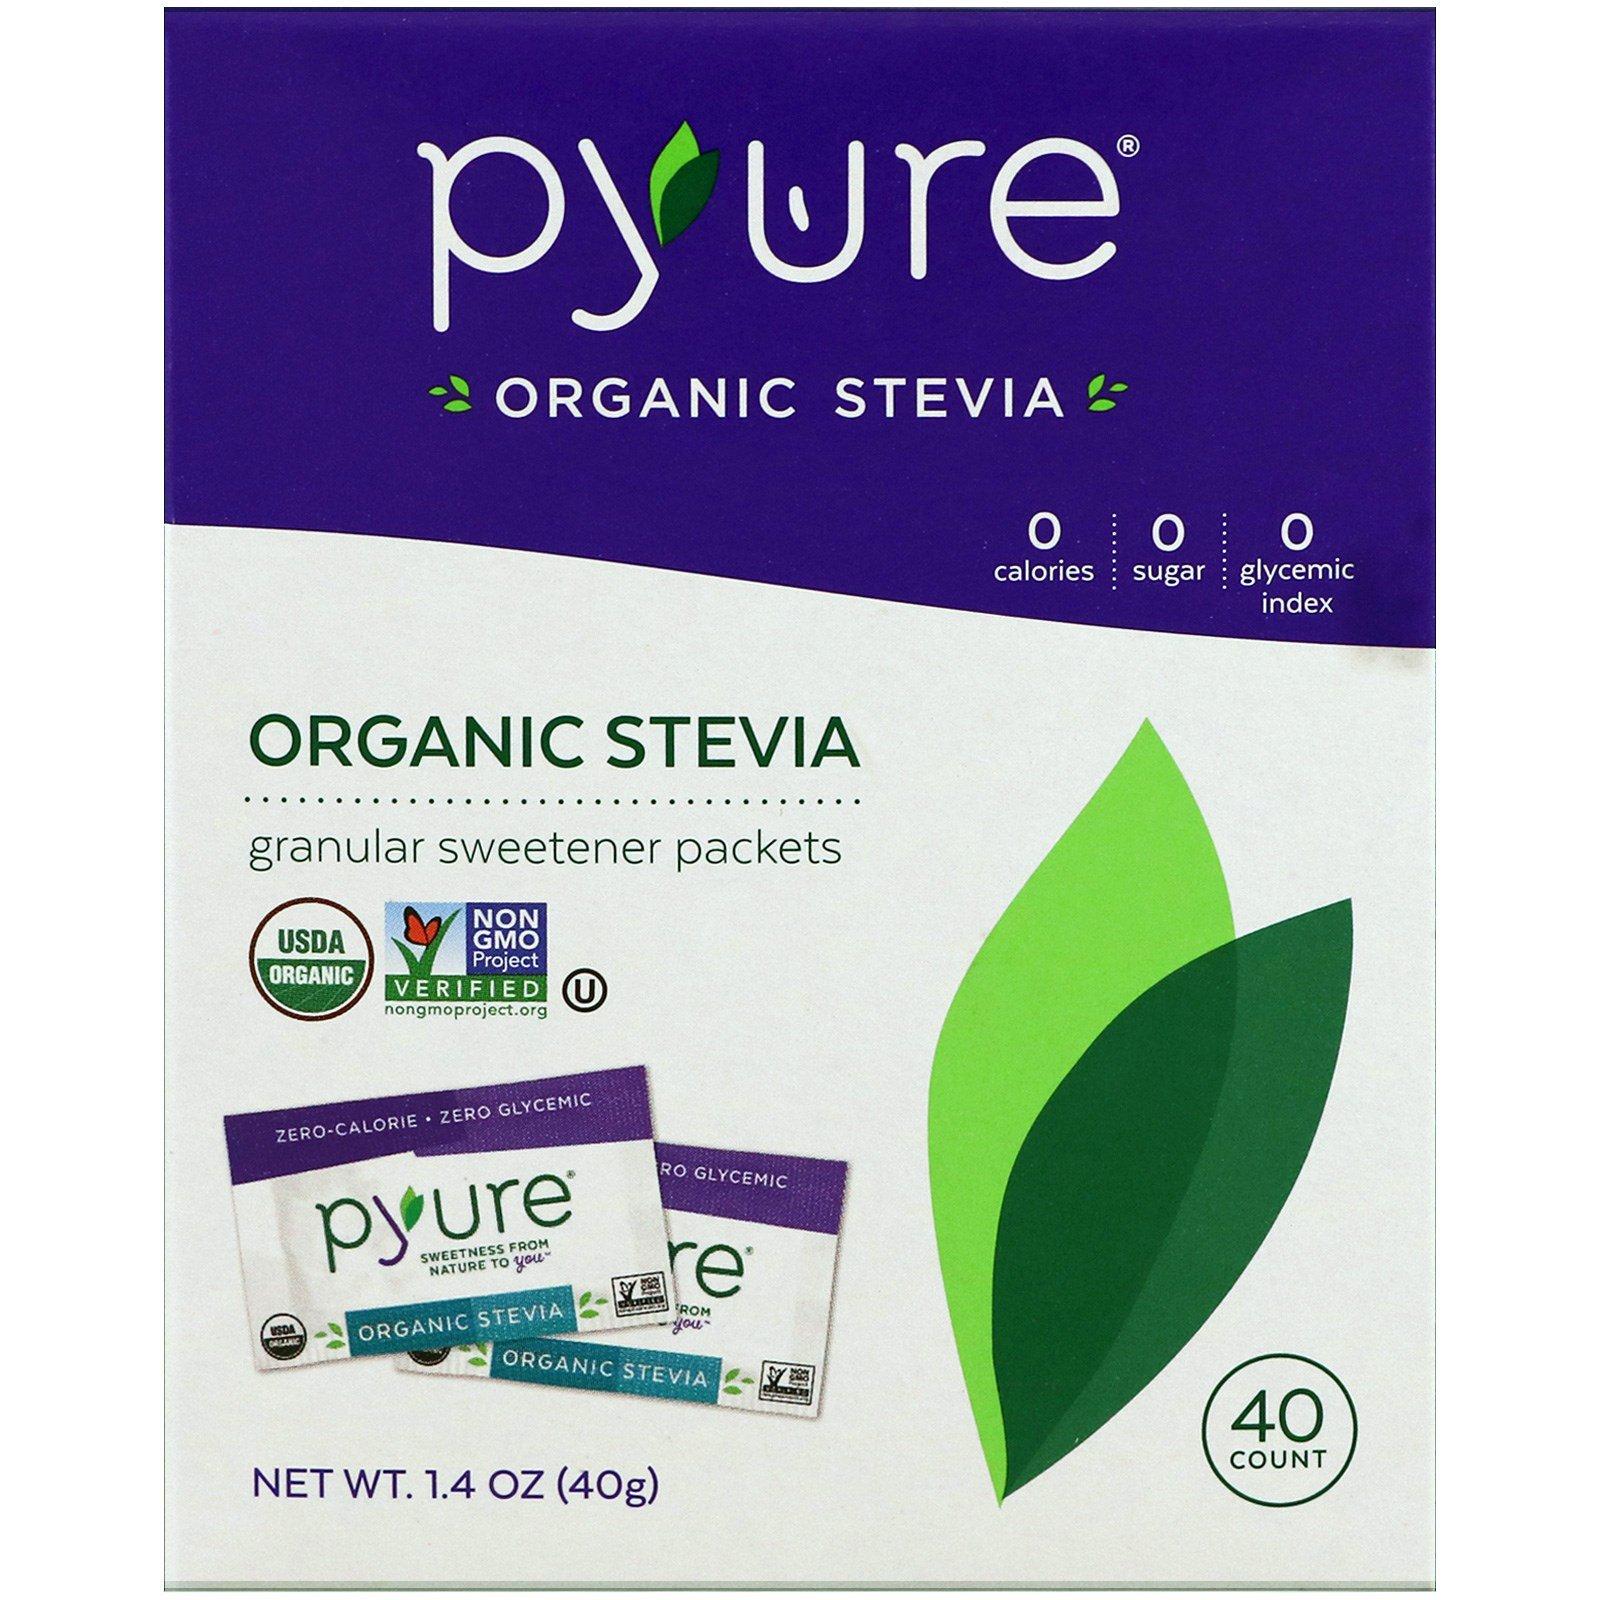 Pyure stevia sweetener